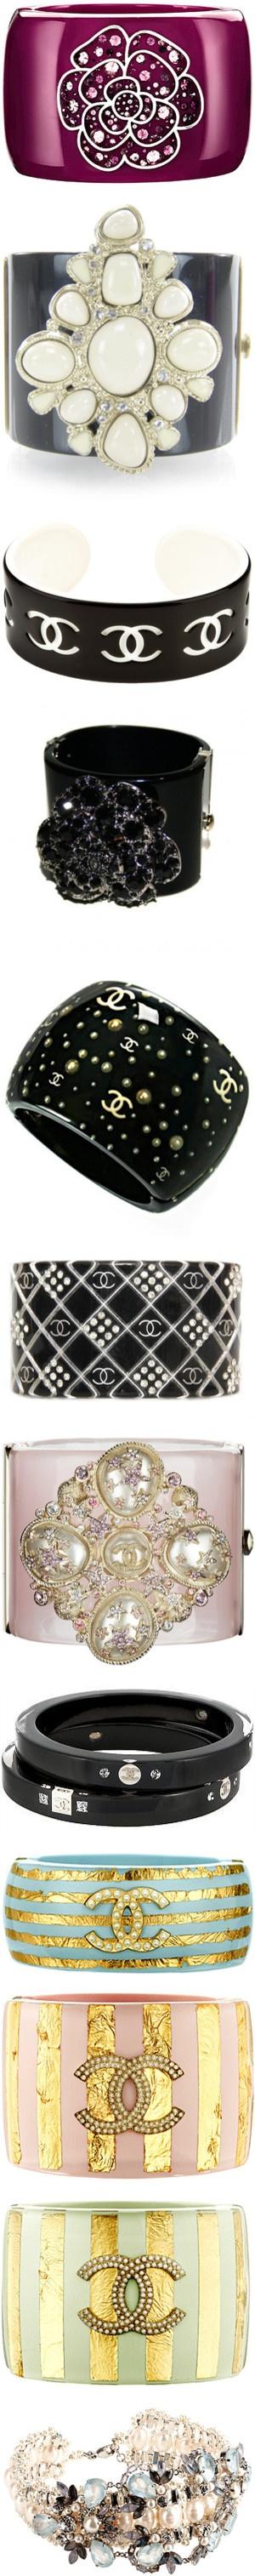 """Chanel Bracelets  Cuffs"" by shazgoldcoast ❤ liked on Polyvore"